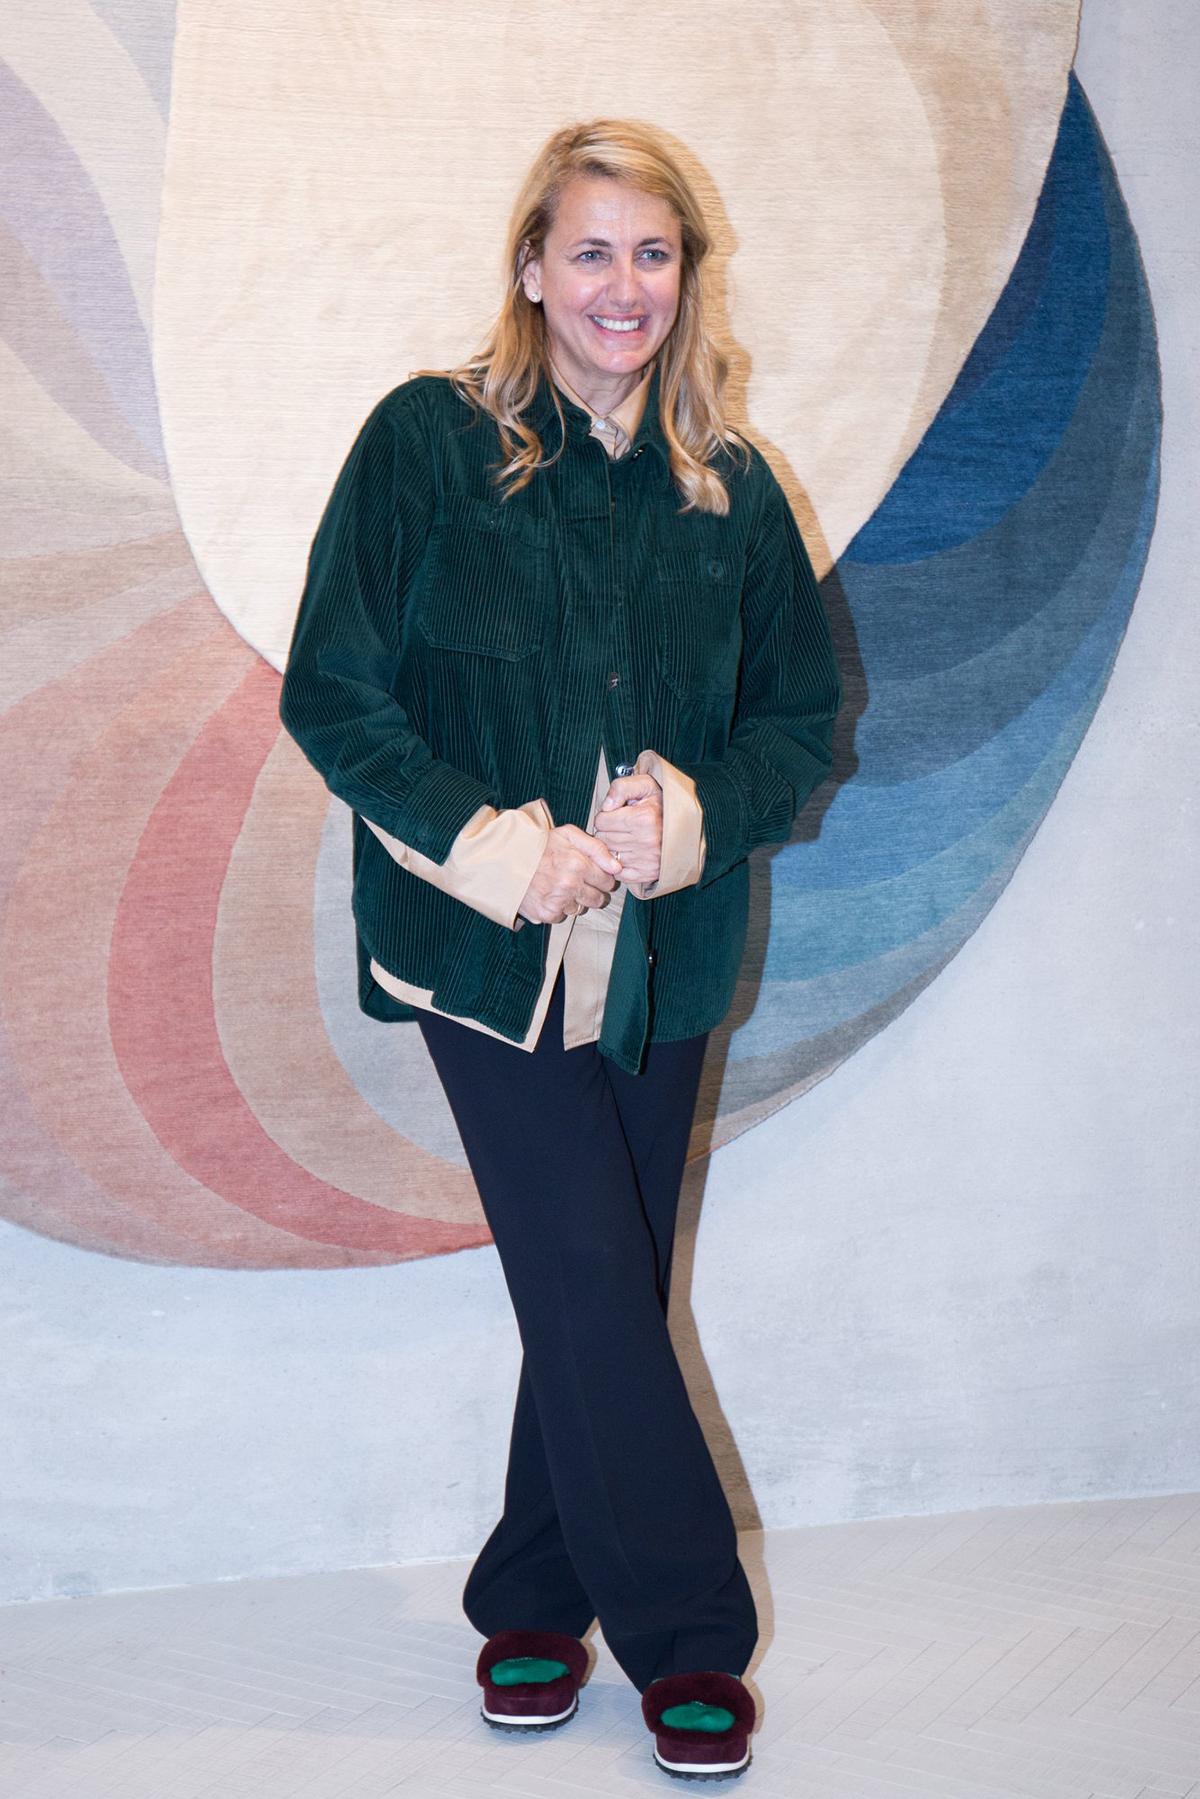 Blog Leem Wonen, Mascha Ekkel, The Art of Living, Milan Design Week, Patricia Urquiola